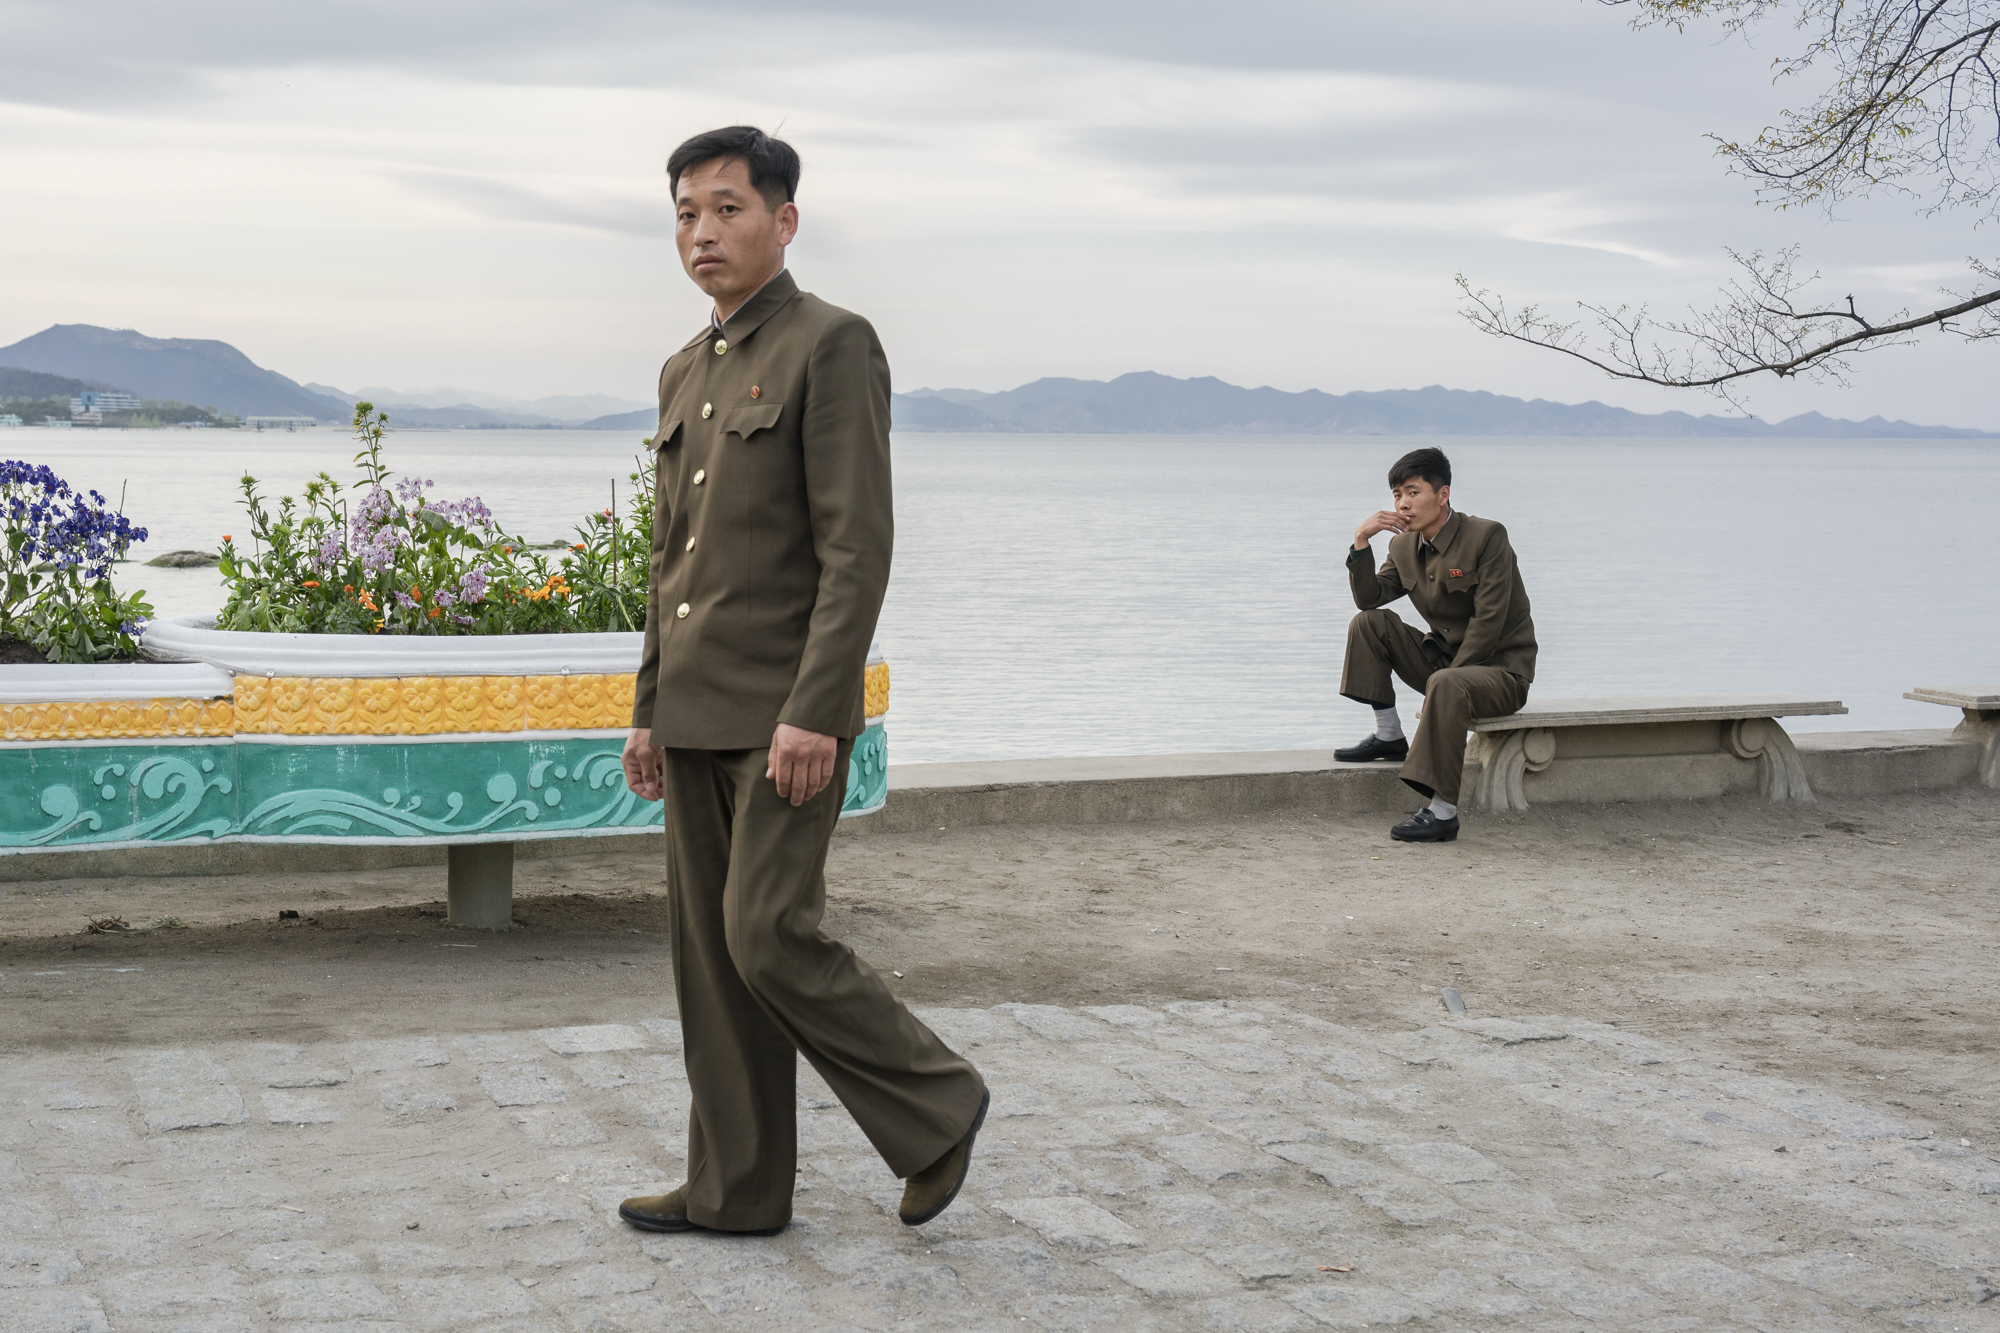 NorthKorea_160419_SNY2716_Web.jpg